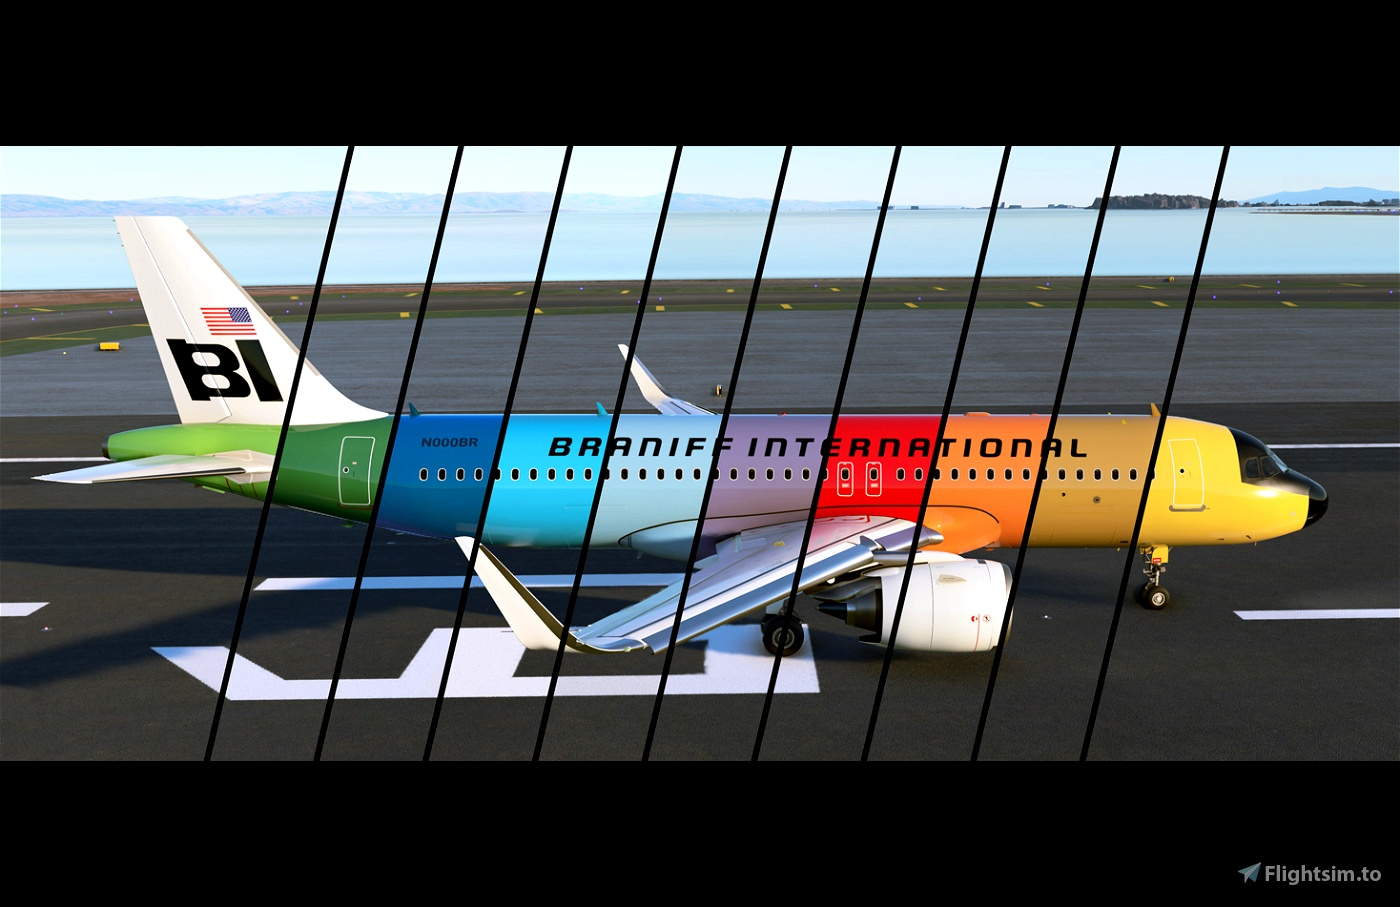 Braniff International Flying Colors Retro 10 Pack [4K Livery] Flight Simulator 2020